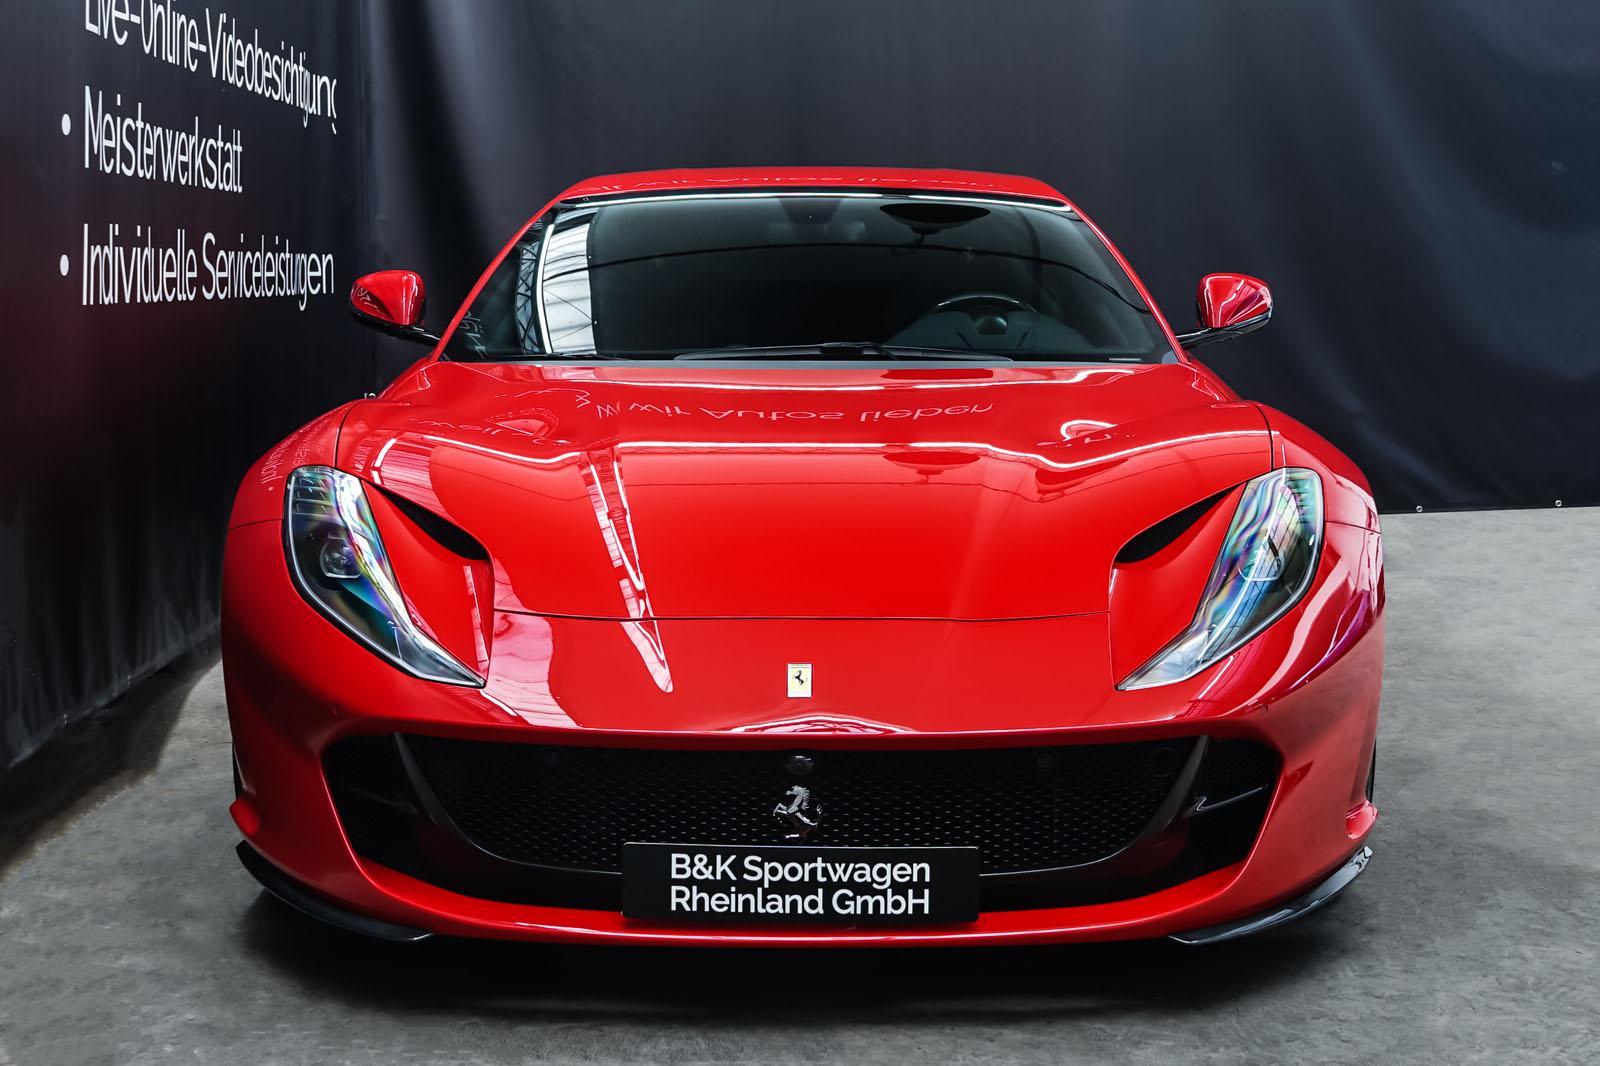 Ferrari_812_Superfast_Rot_Schwarz_FER-9922_1_w